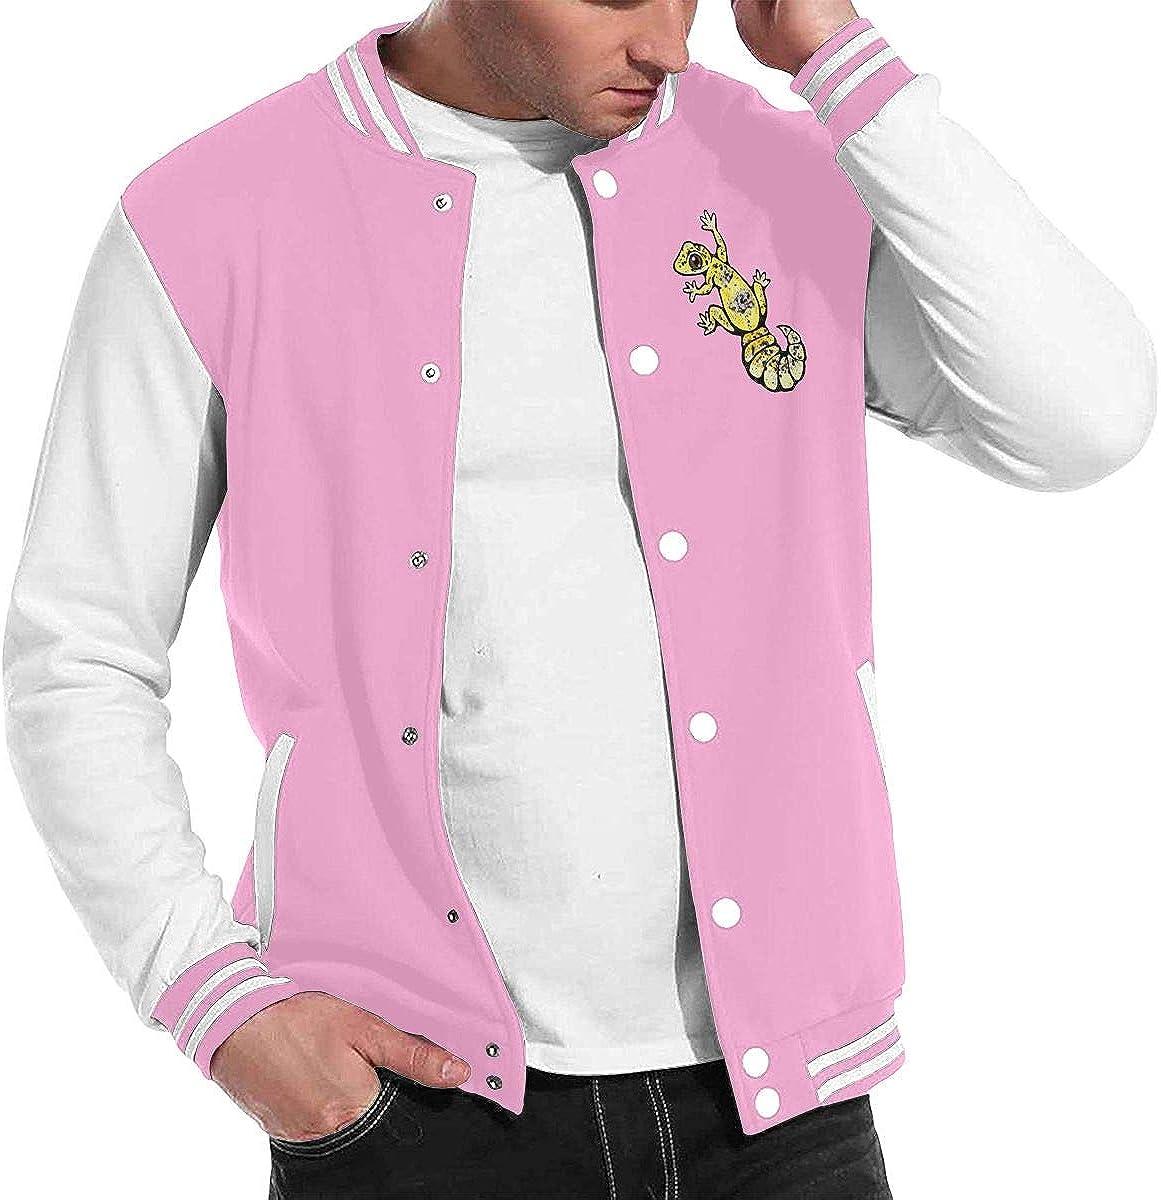 JJKKFG-H Yellow Complete Free Shipping Rapid rise Leopard Gecko Mens Jack Uniform Baseball Fashion